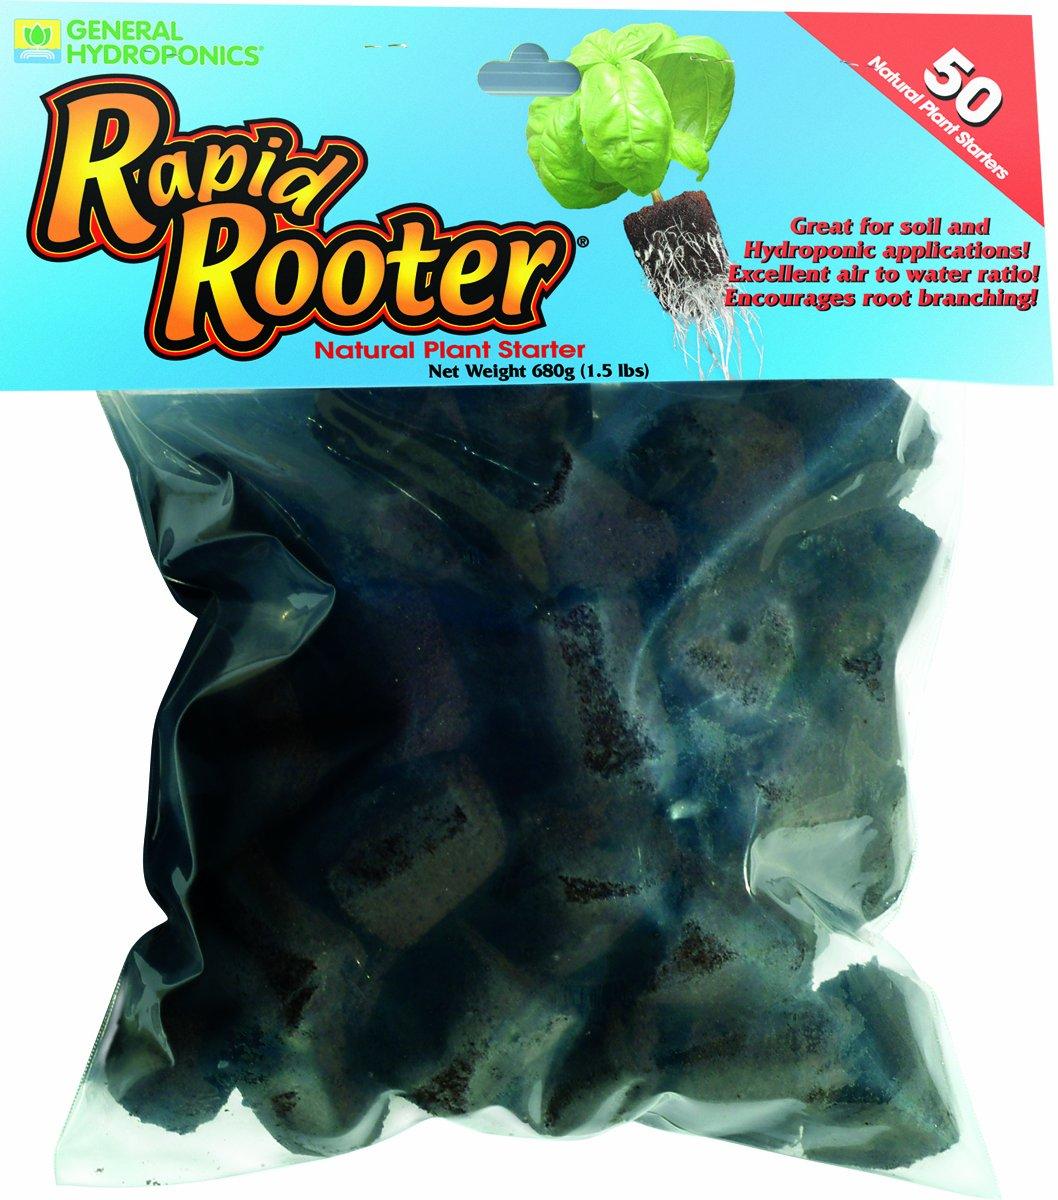 Hydroponic Rapid Rooter Replacement Plugs Seed Garden Indoor Growing